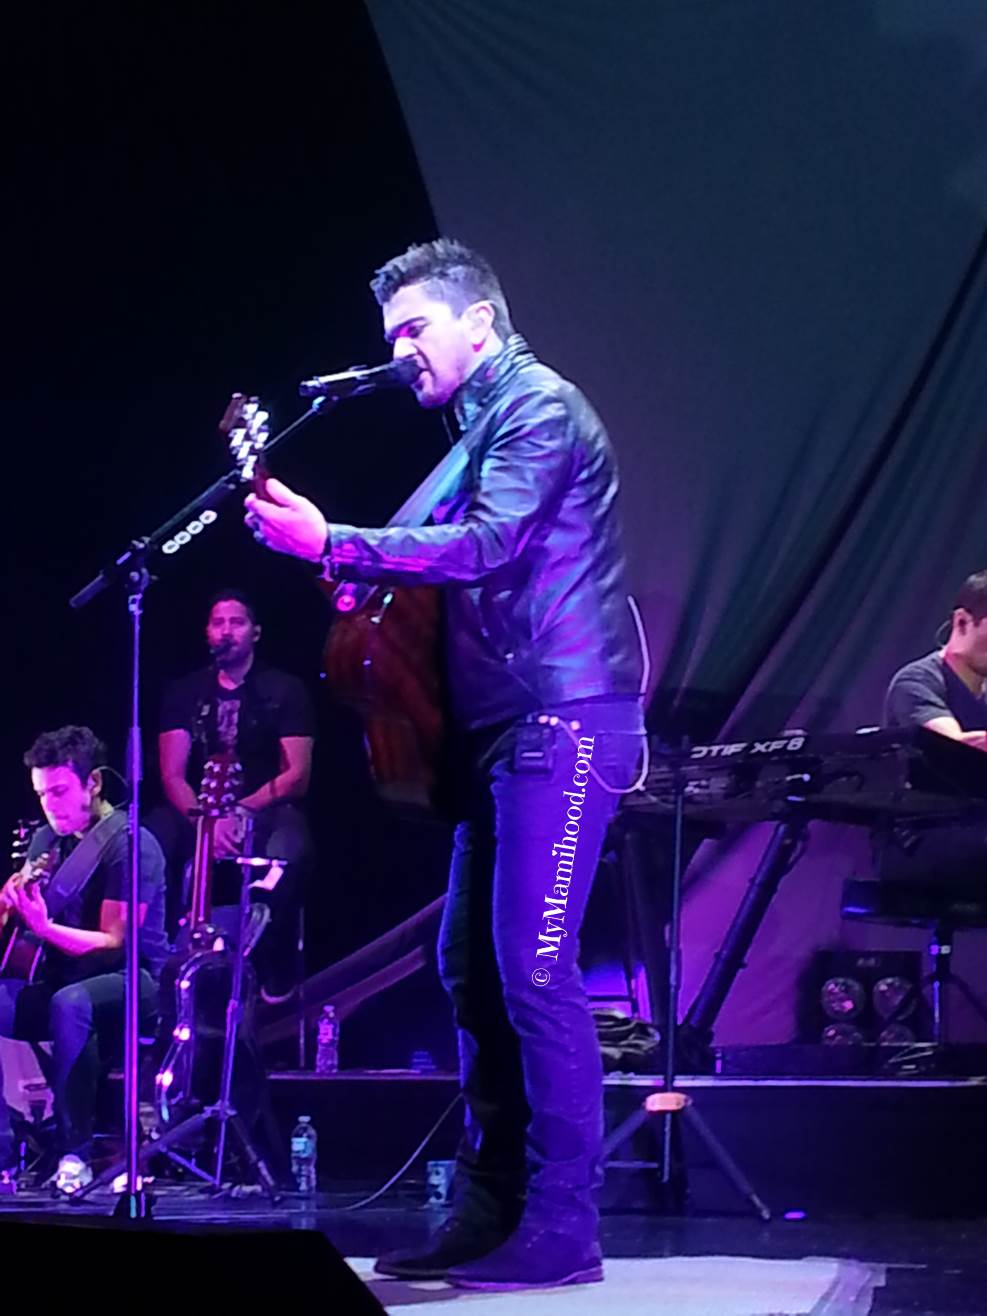 Juanes_Singing2.jpg